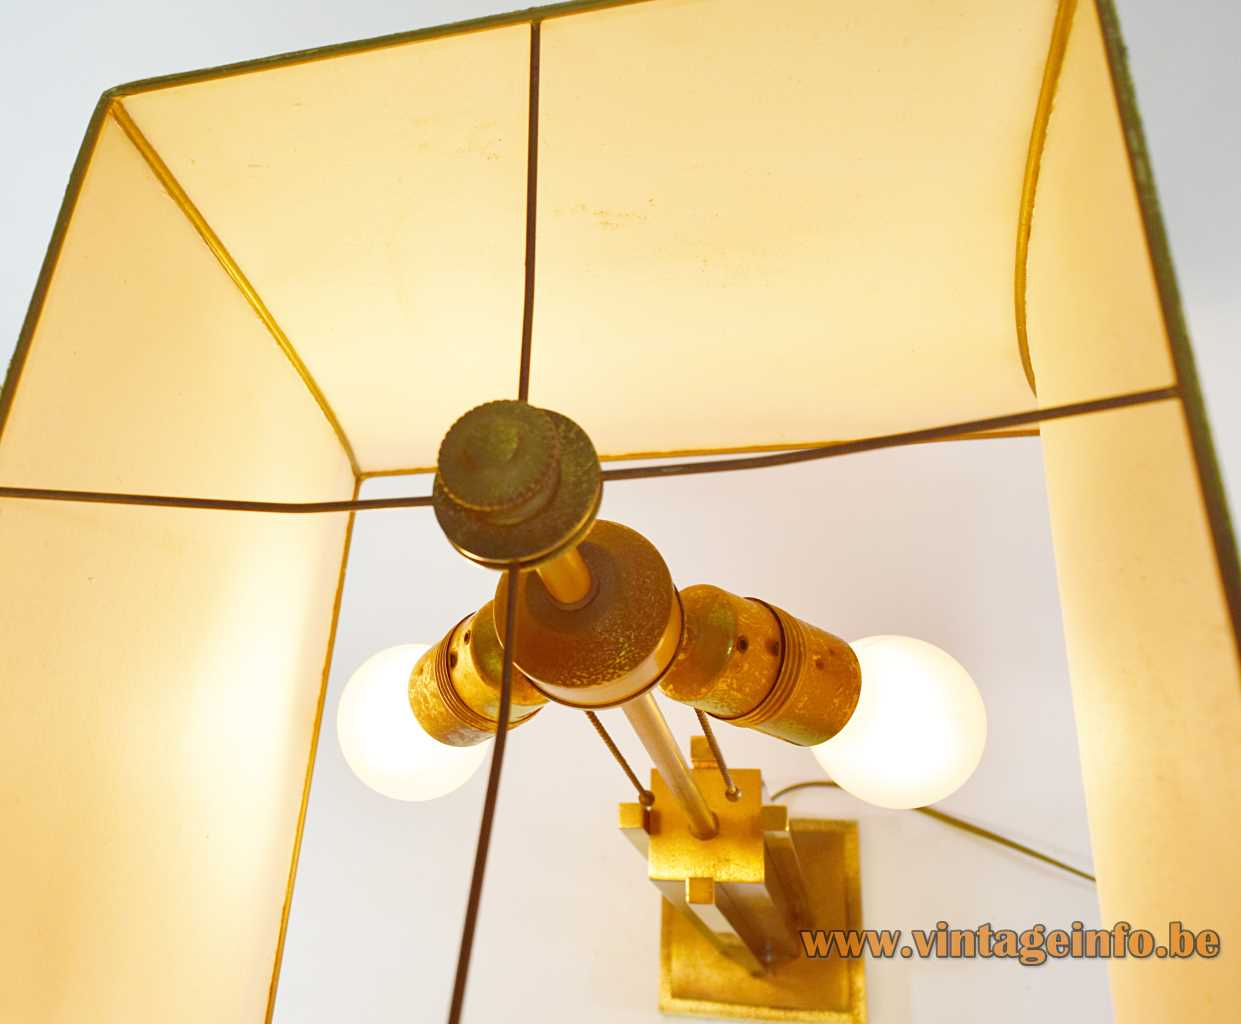 Belgo Chrom brass table lamp sculptural geometric skyscraper base pagoda lampshade 2 E27 sockets 1960s 1970s